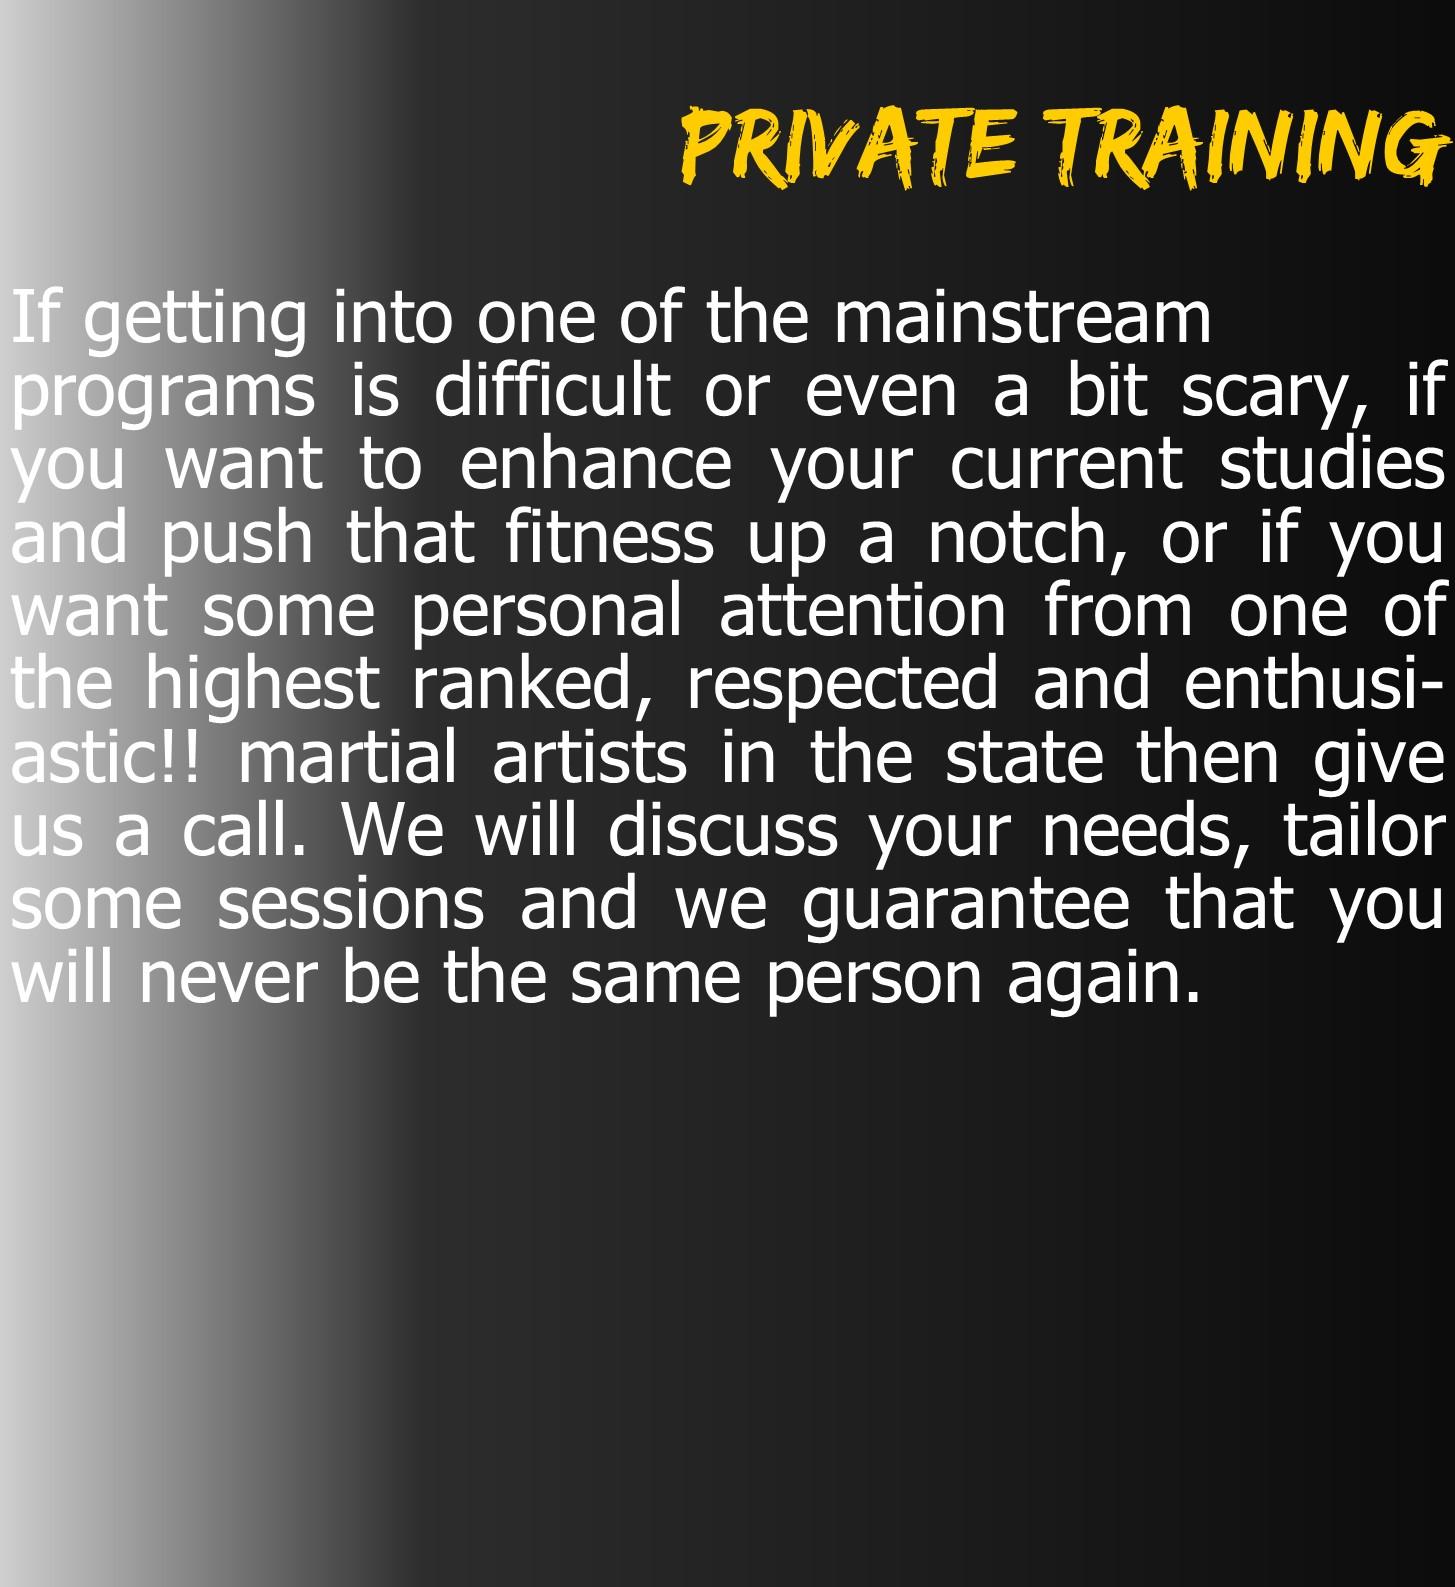 Privte Training Text.jpg